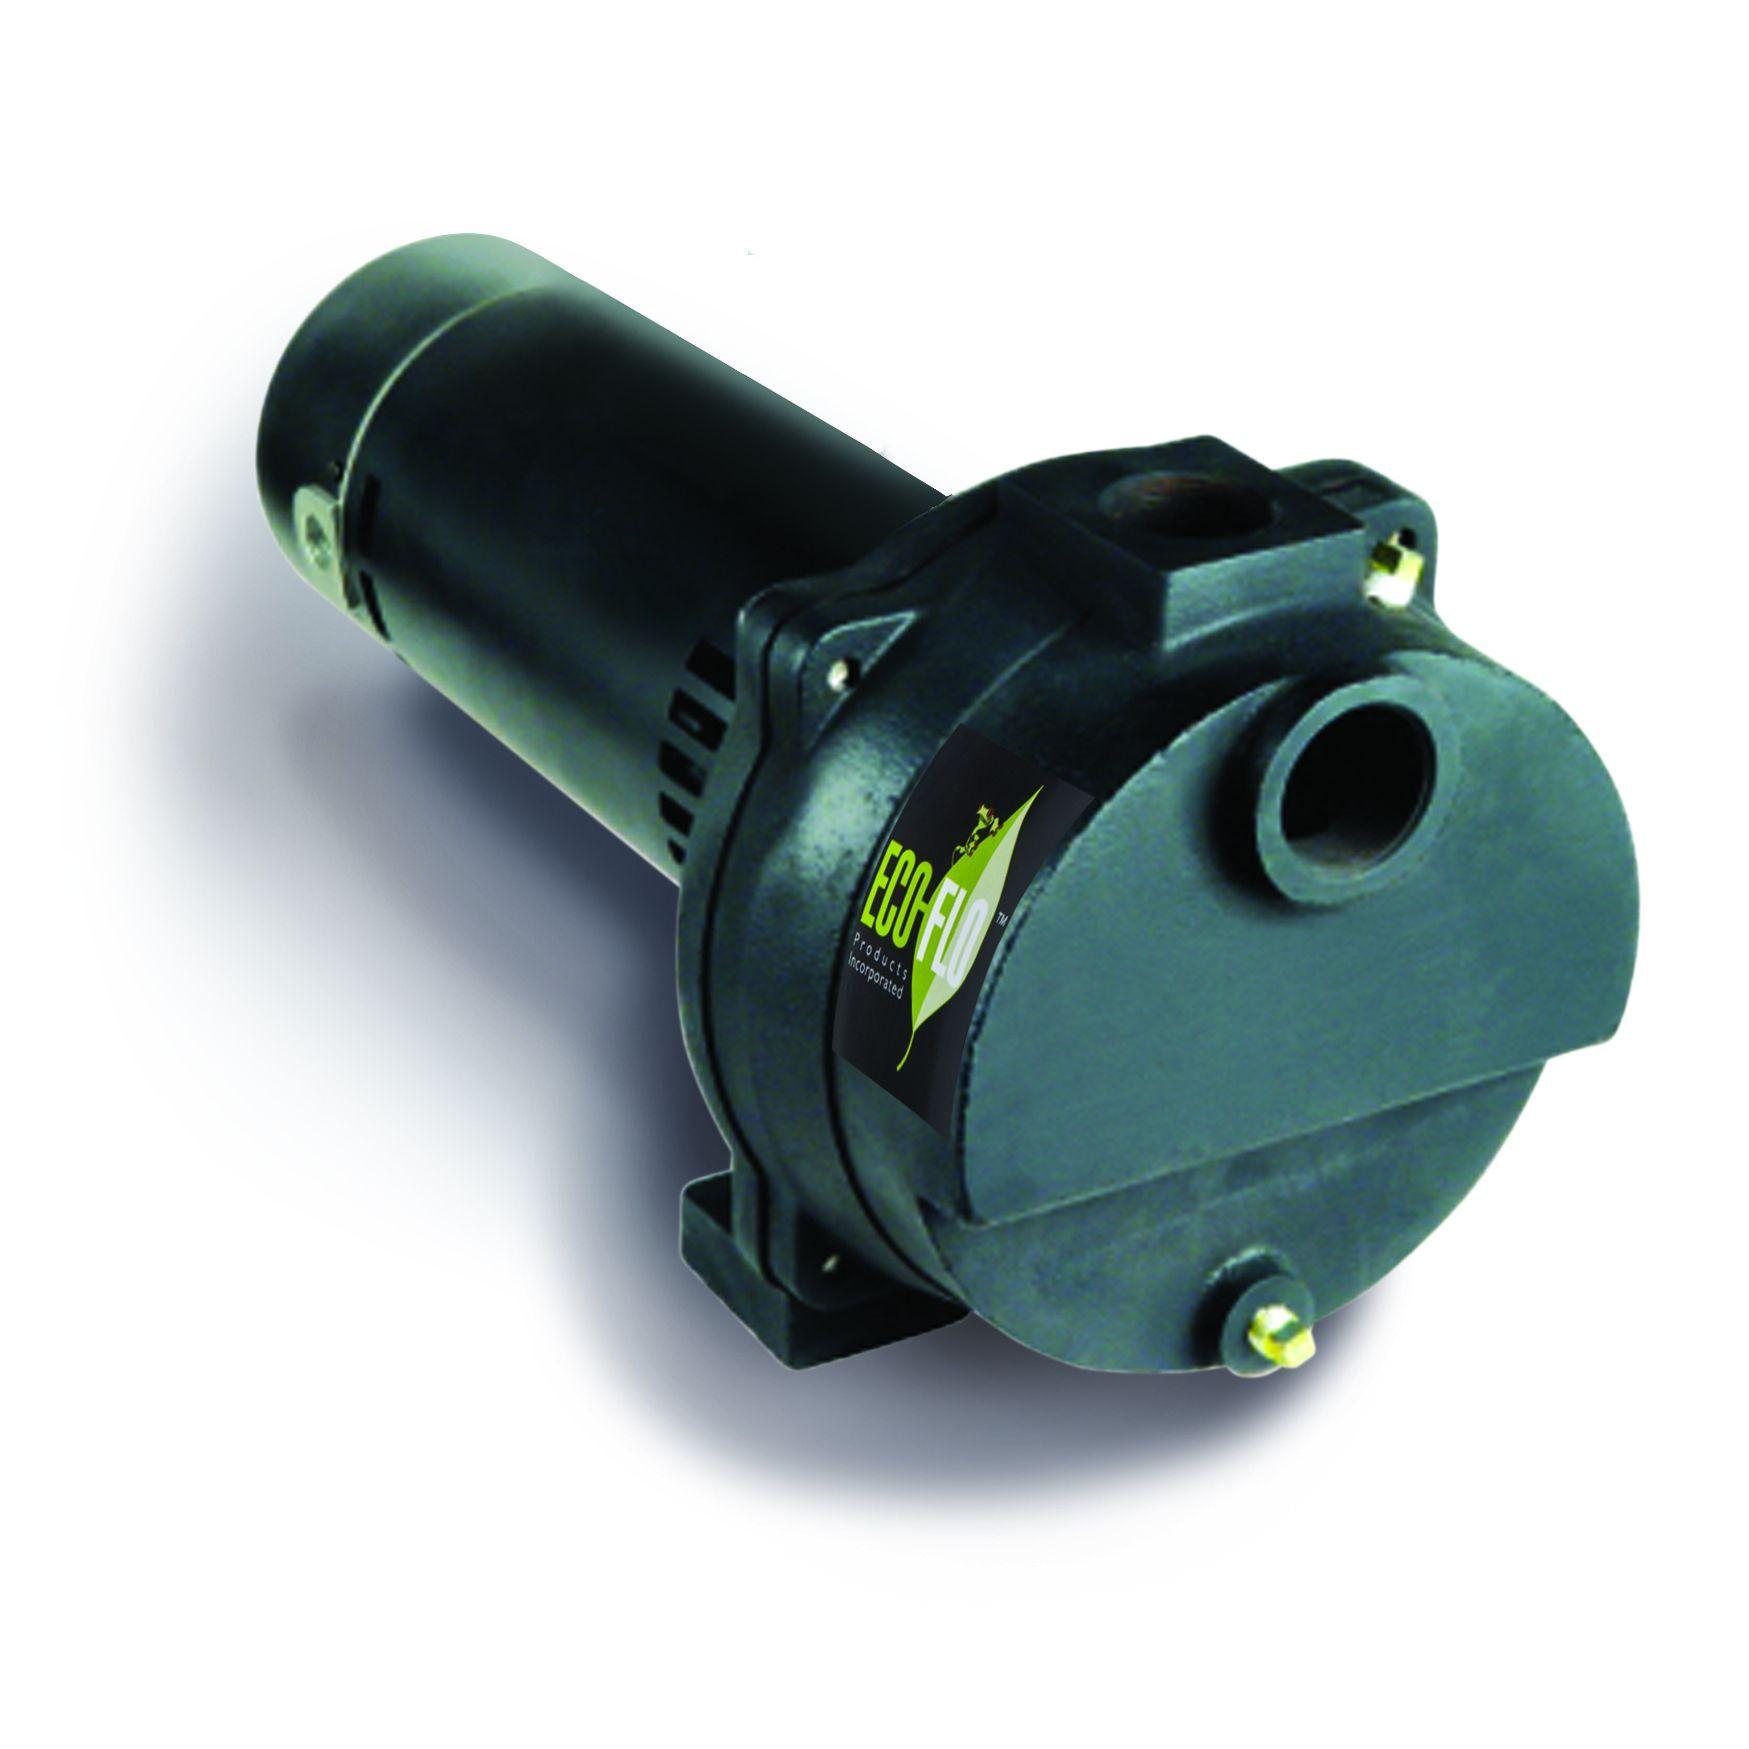 Eco-Flo Products EFLS10 1 HP Cast Iron Irrigation Pump (EFLS10 ...